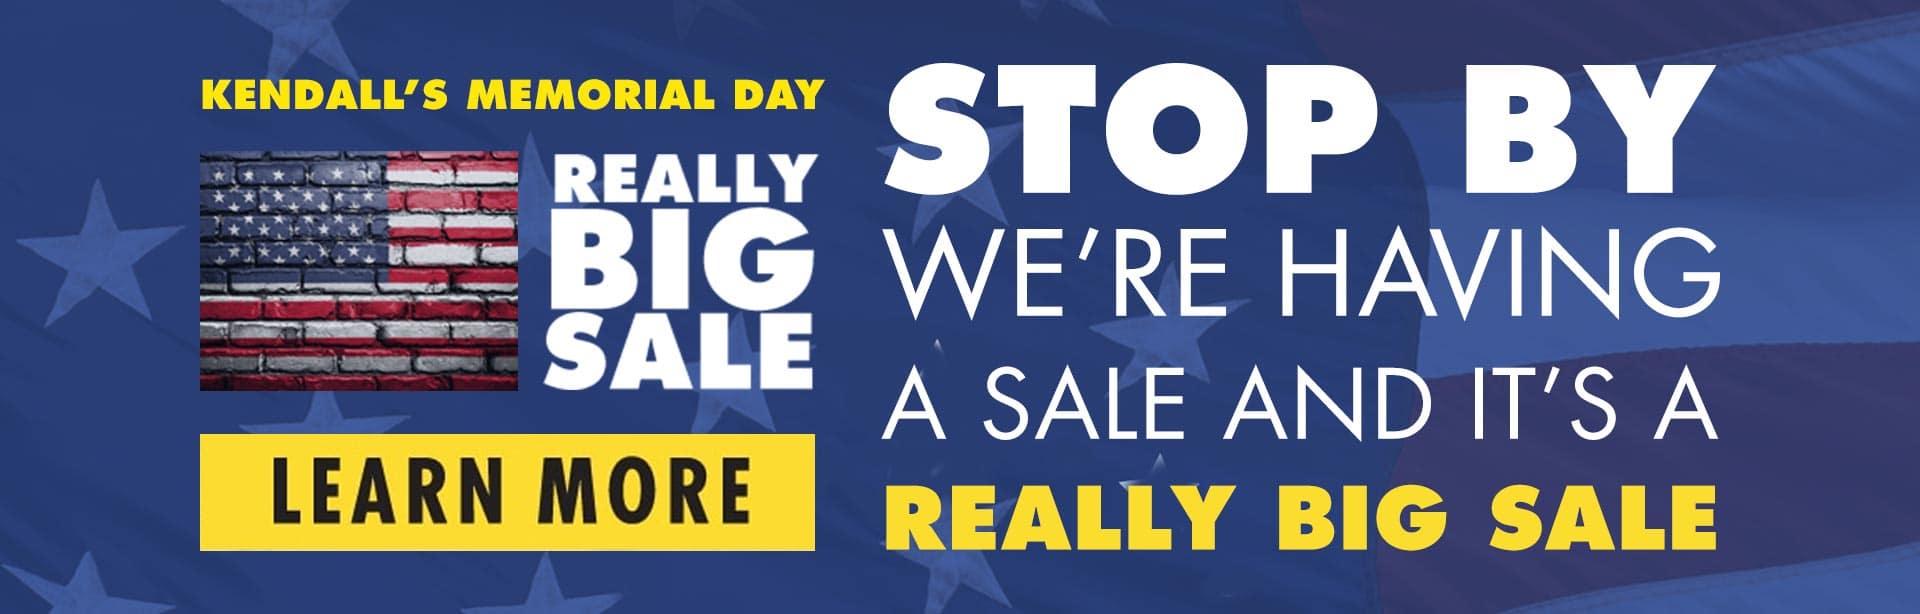 toyota really big sale